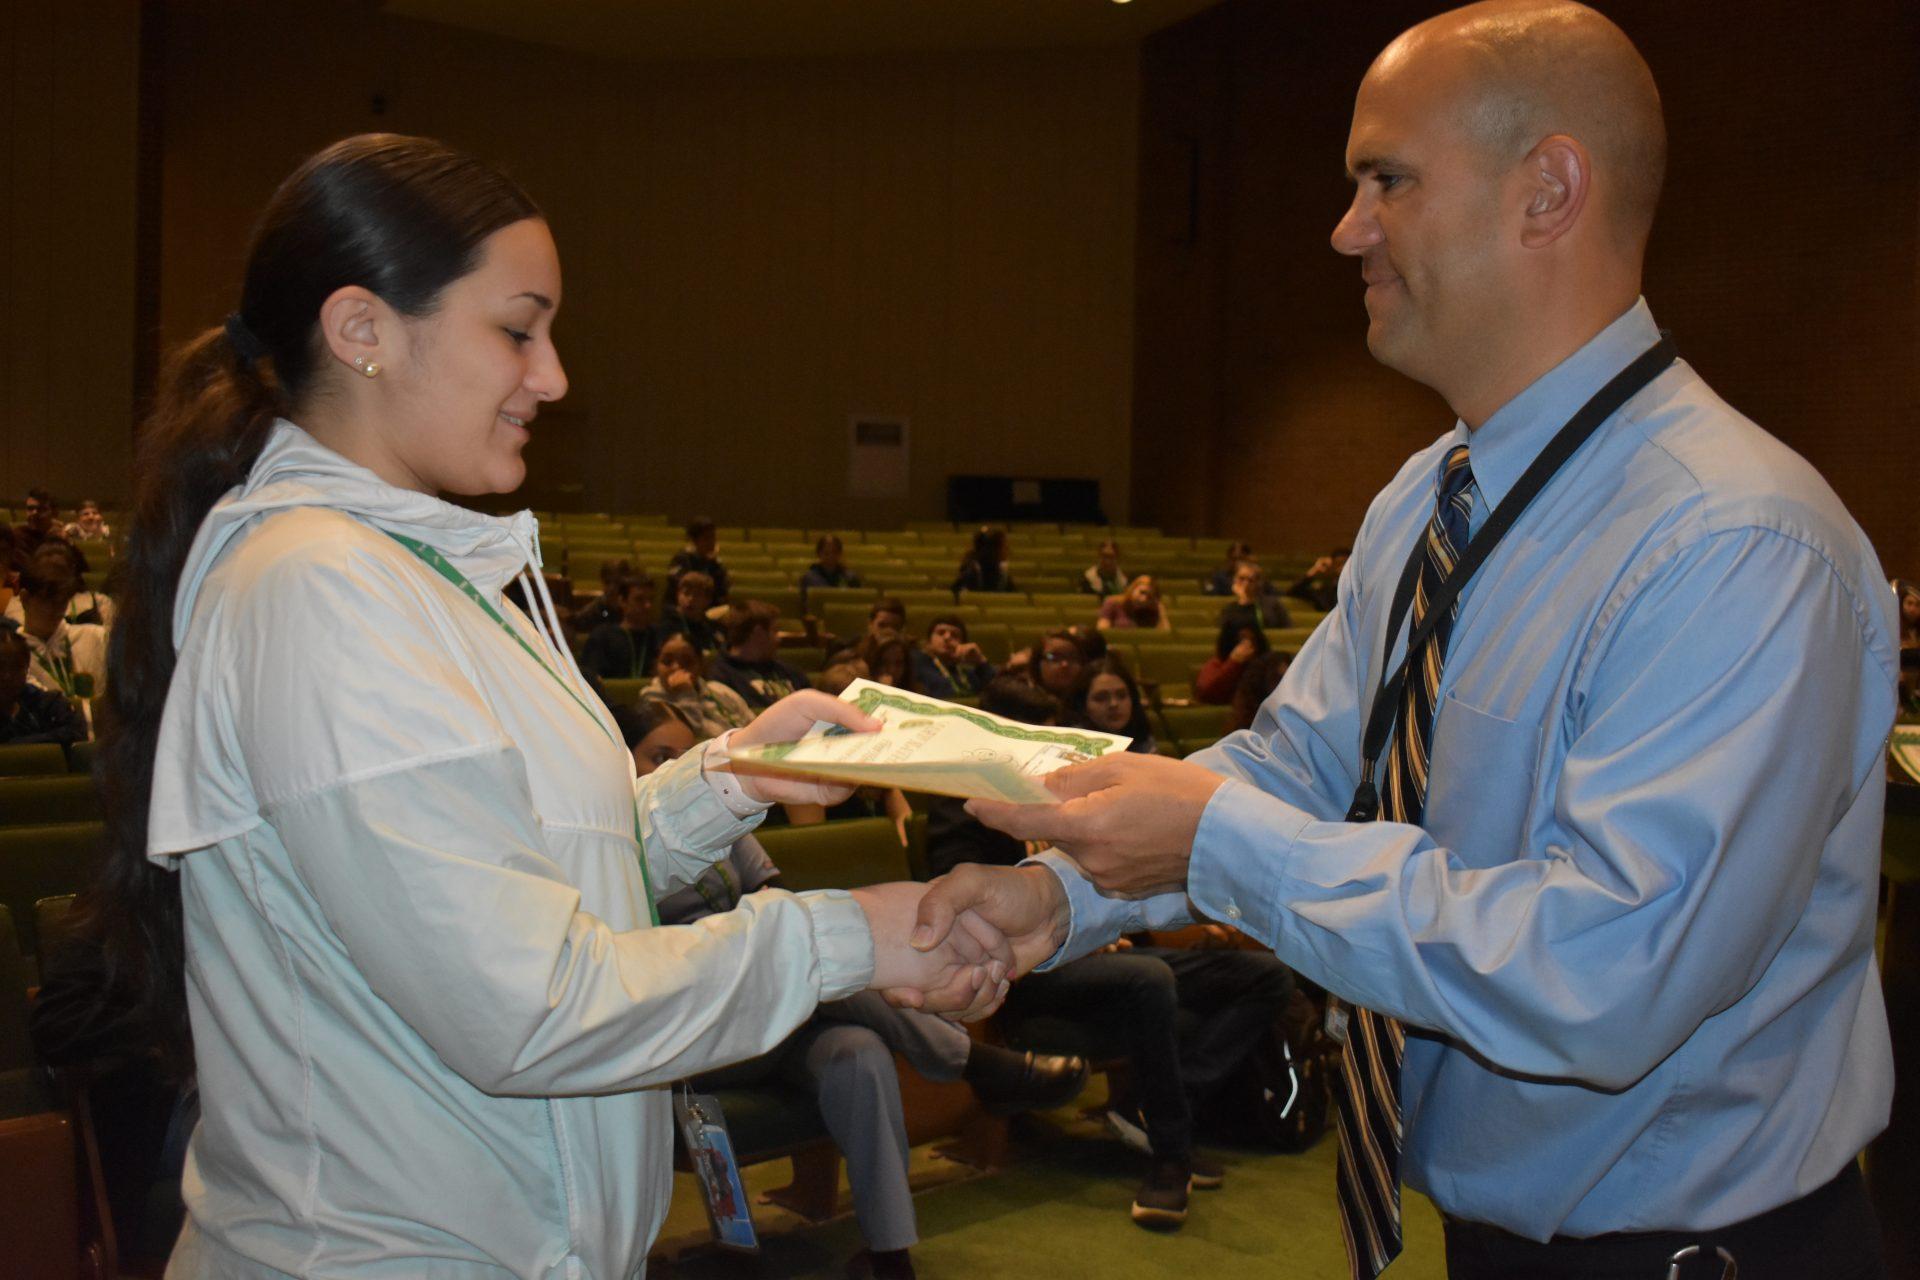 Renaissance Awards Mr. Viera gives a certificate